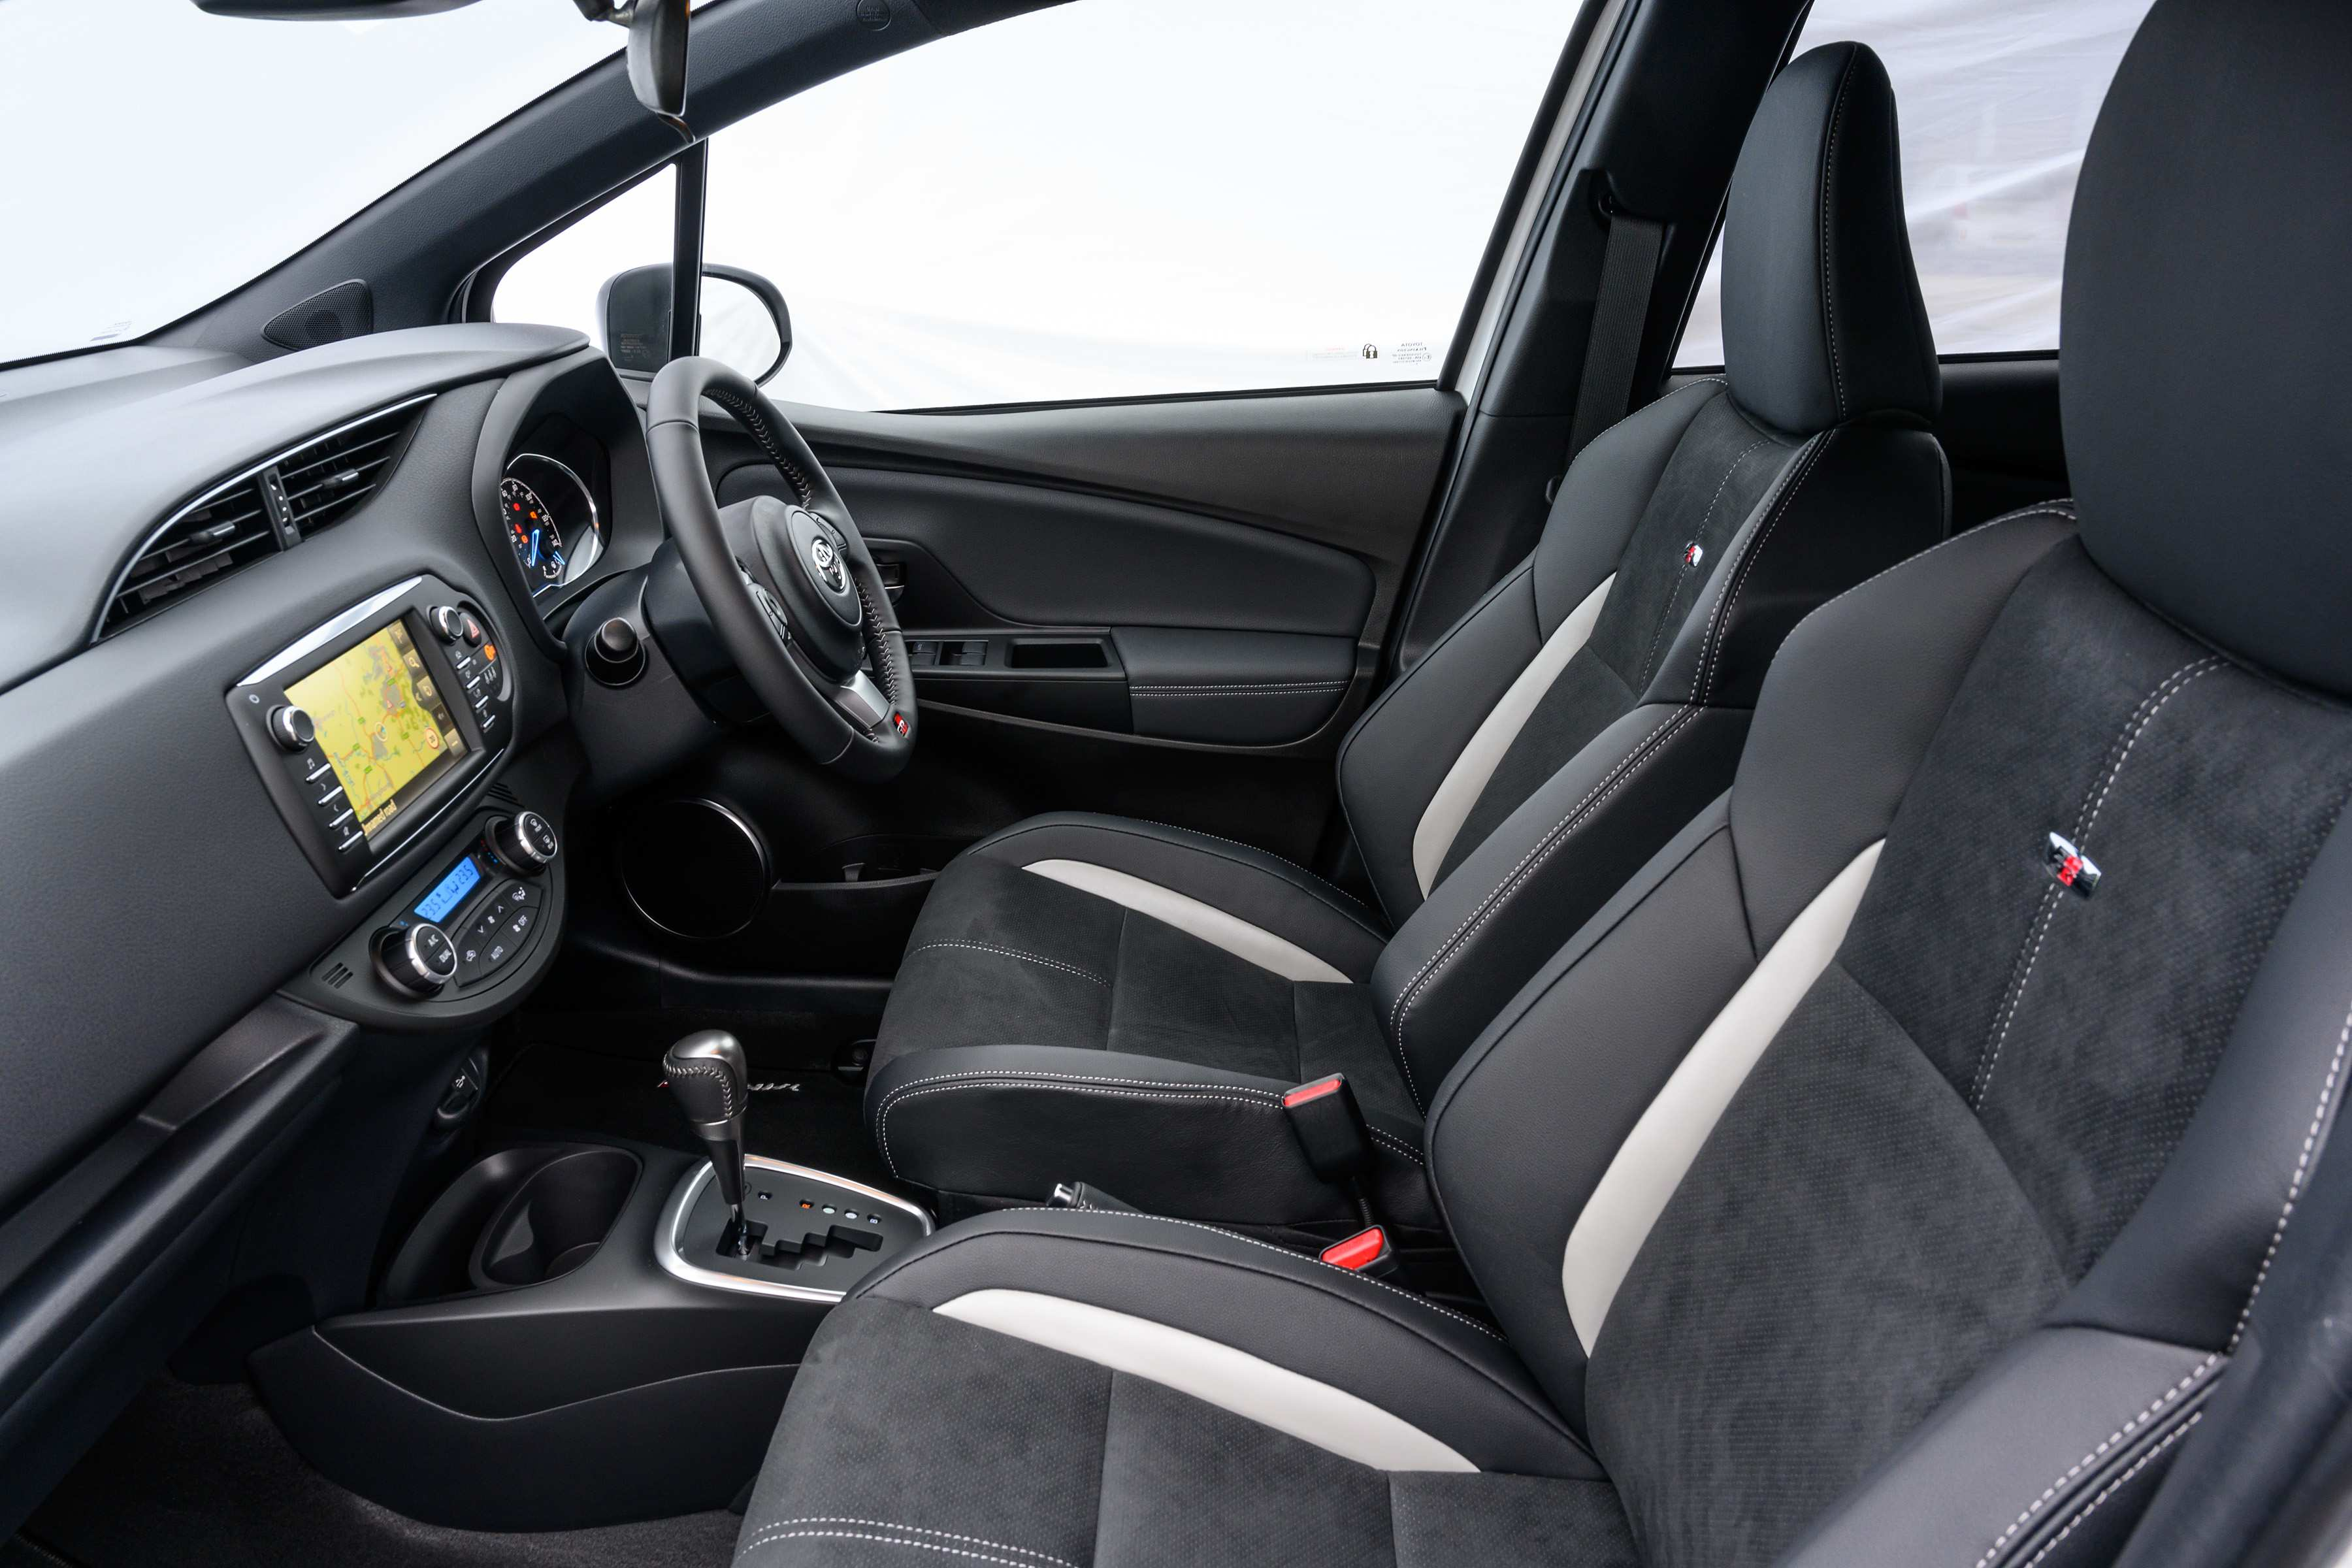 15 New Toyota Yaris 2019 Interior Exterior by Toyota Yaris 2019 Interior